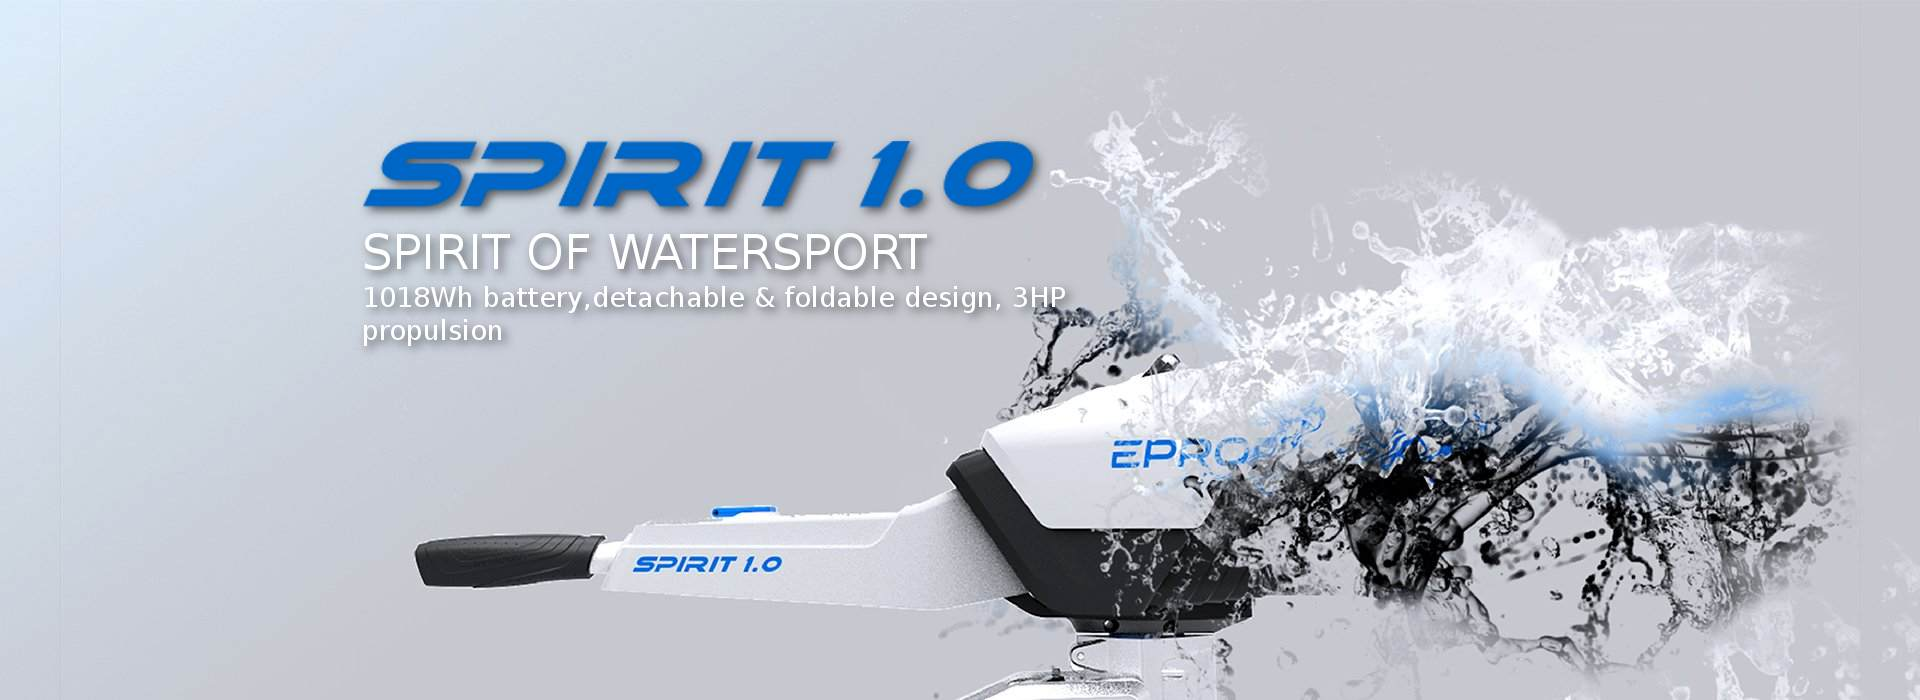 Epropulsion Spirit 1.0 Dıştan Takma Elektrikli Motor